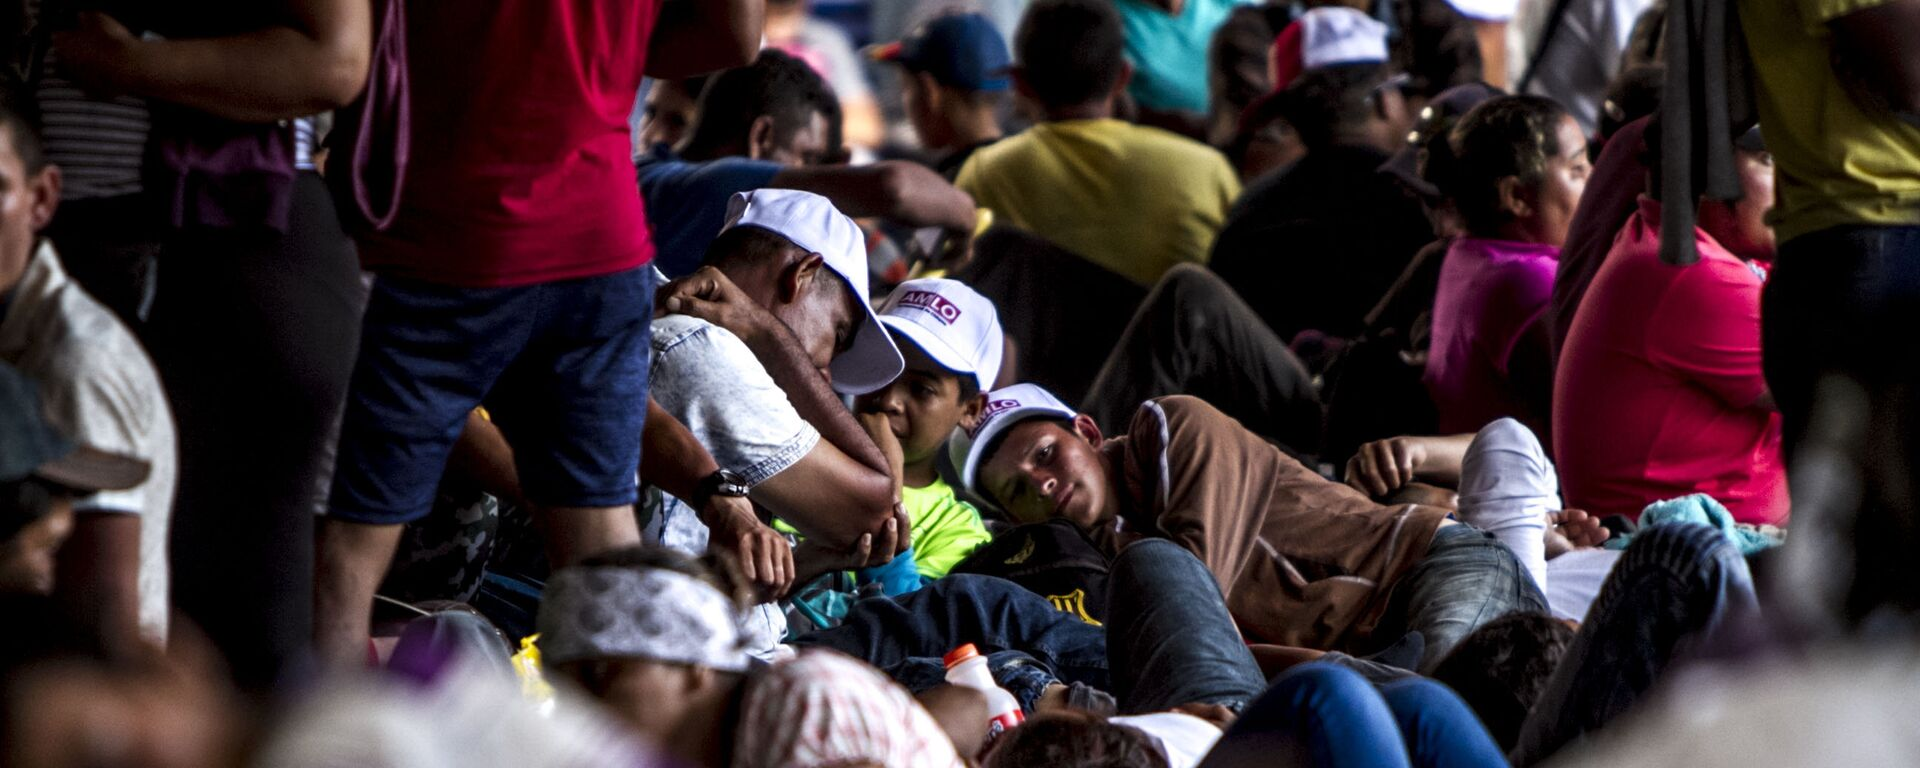 Miles de migrantes centroamericanos - Sputnik Mundo, 1920, 17.08.2021